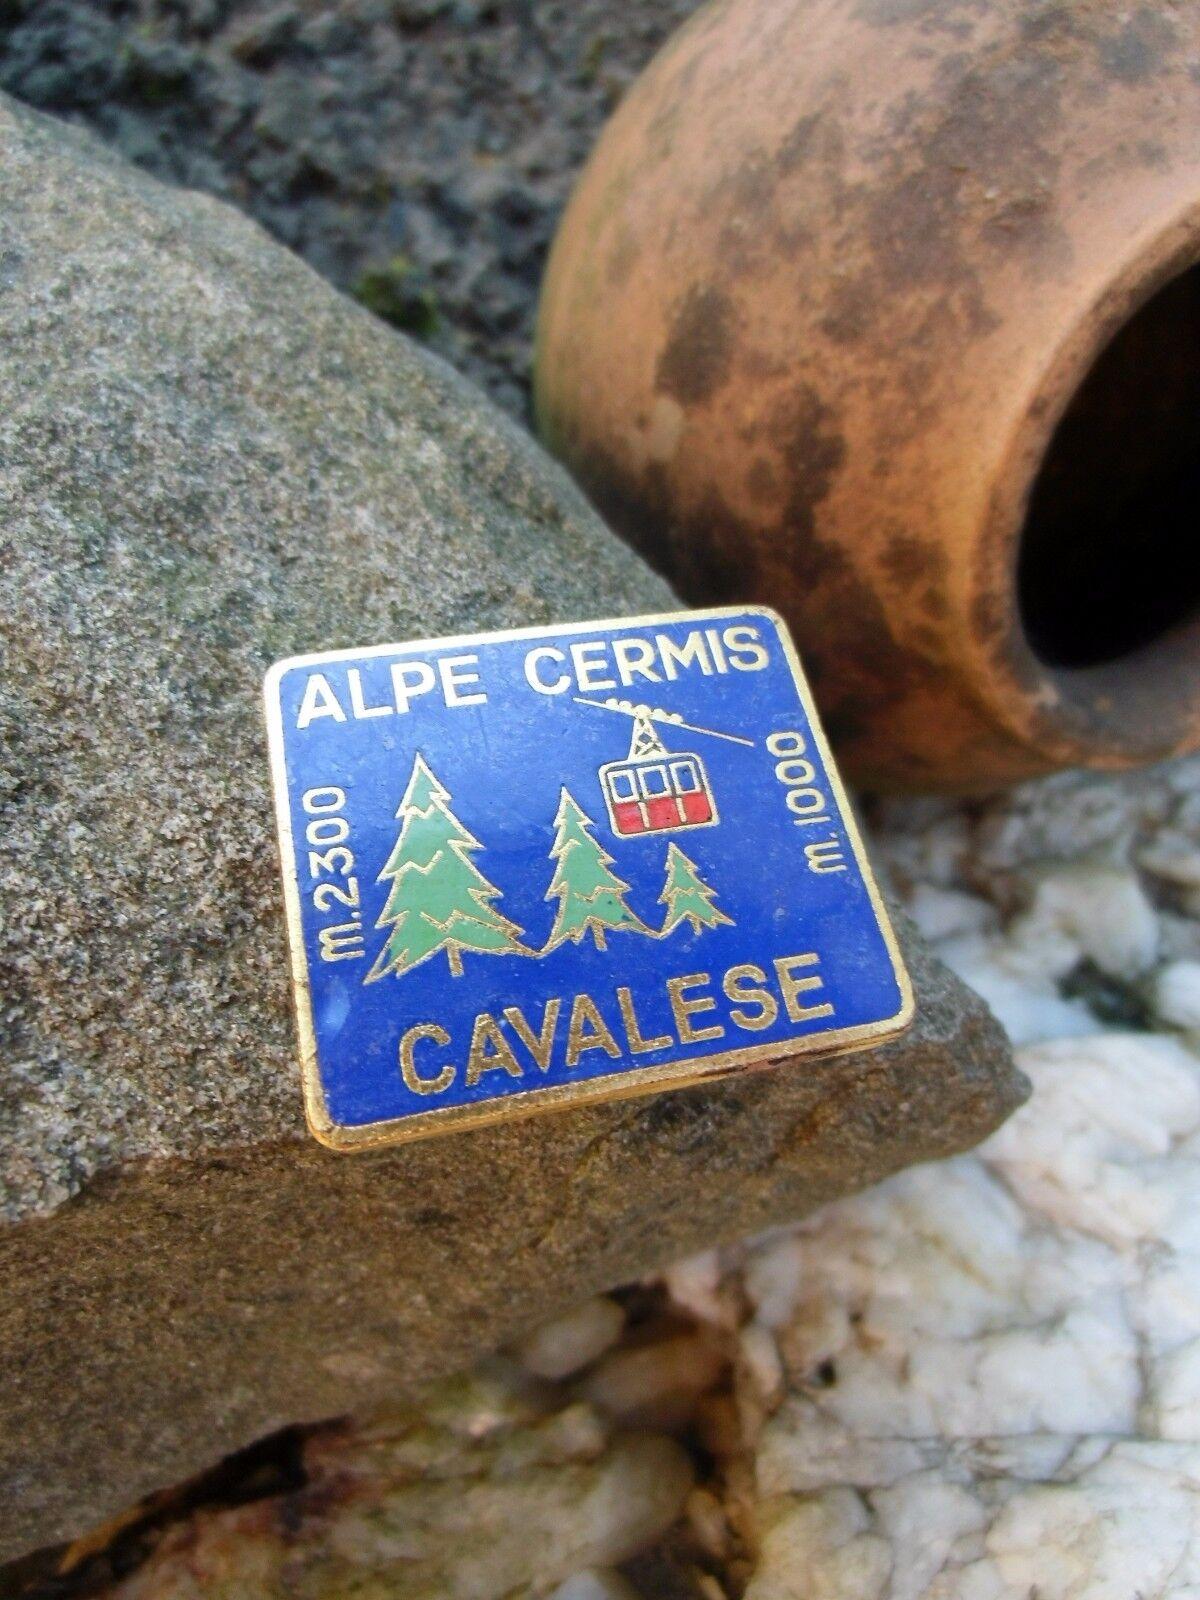 Rare vintage CAVALESE Alpe Cermis  SKI 1960s-70s enamel needle Pin Badge